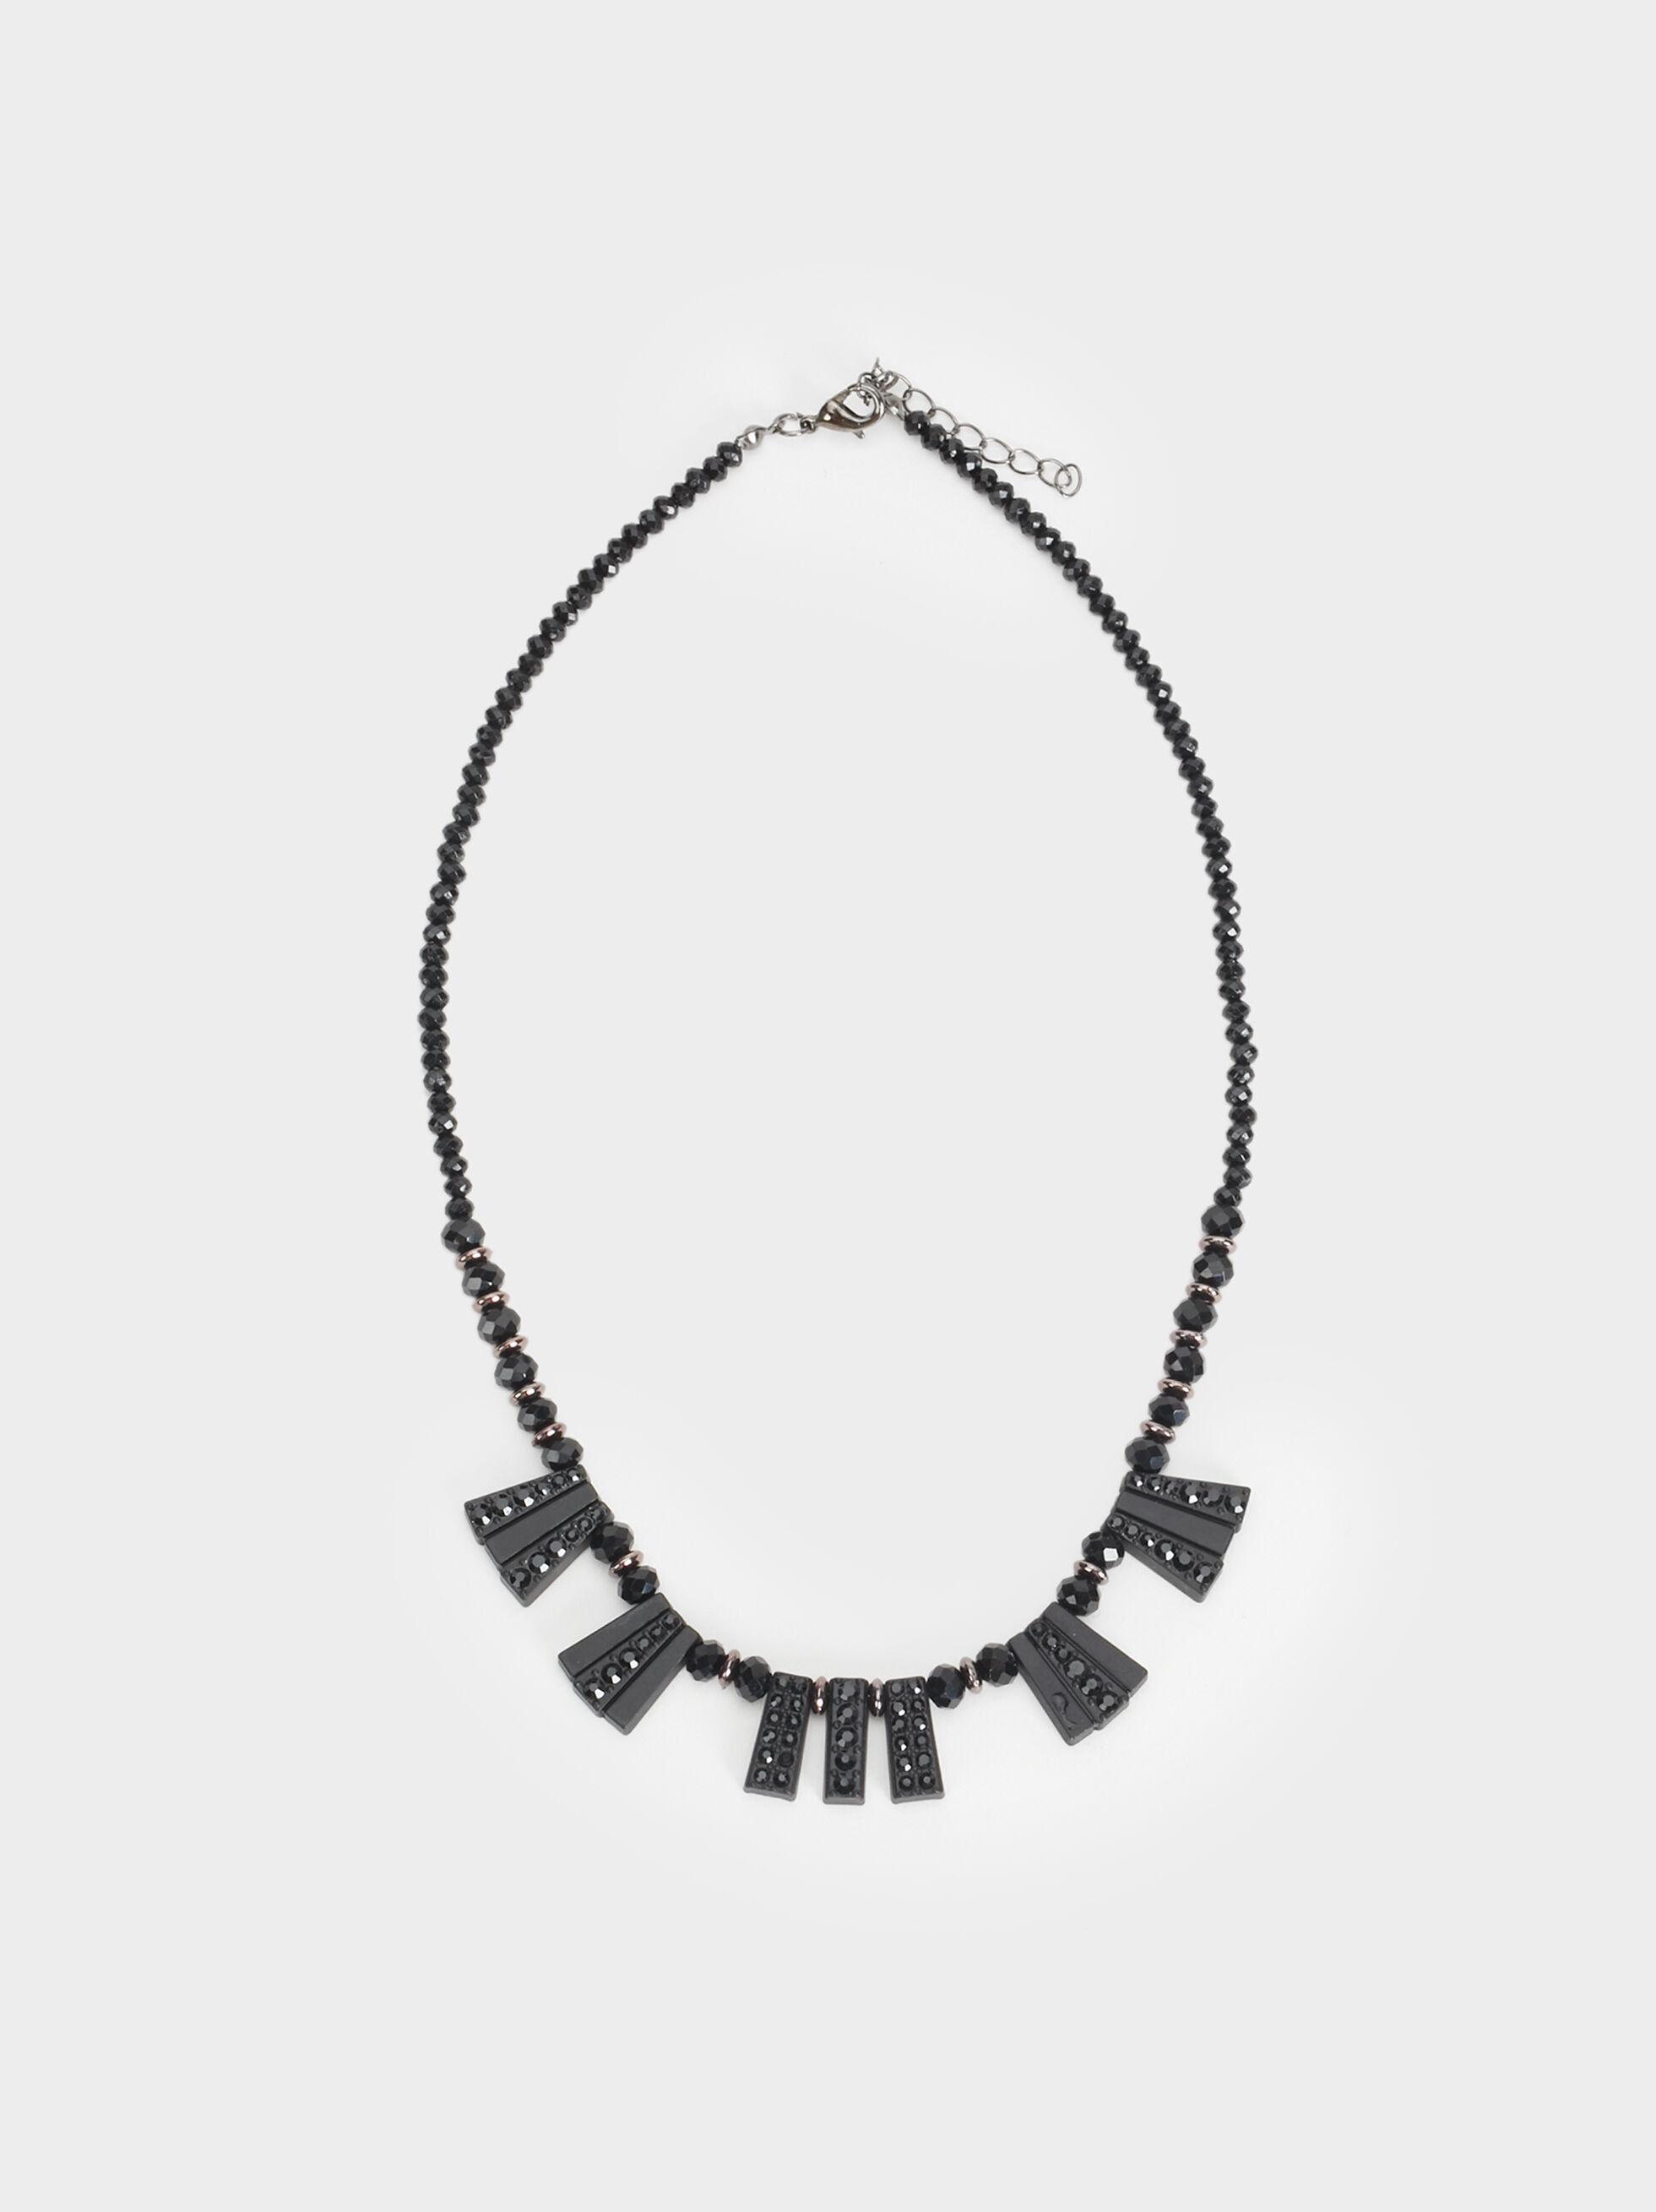 Star Dust Short Necklace With Pendants, Black, hi-res